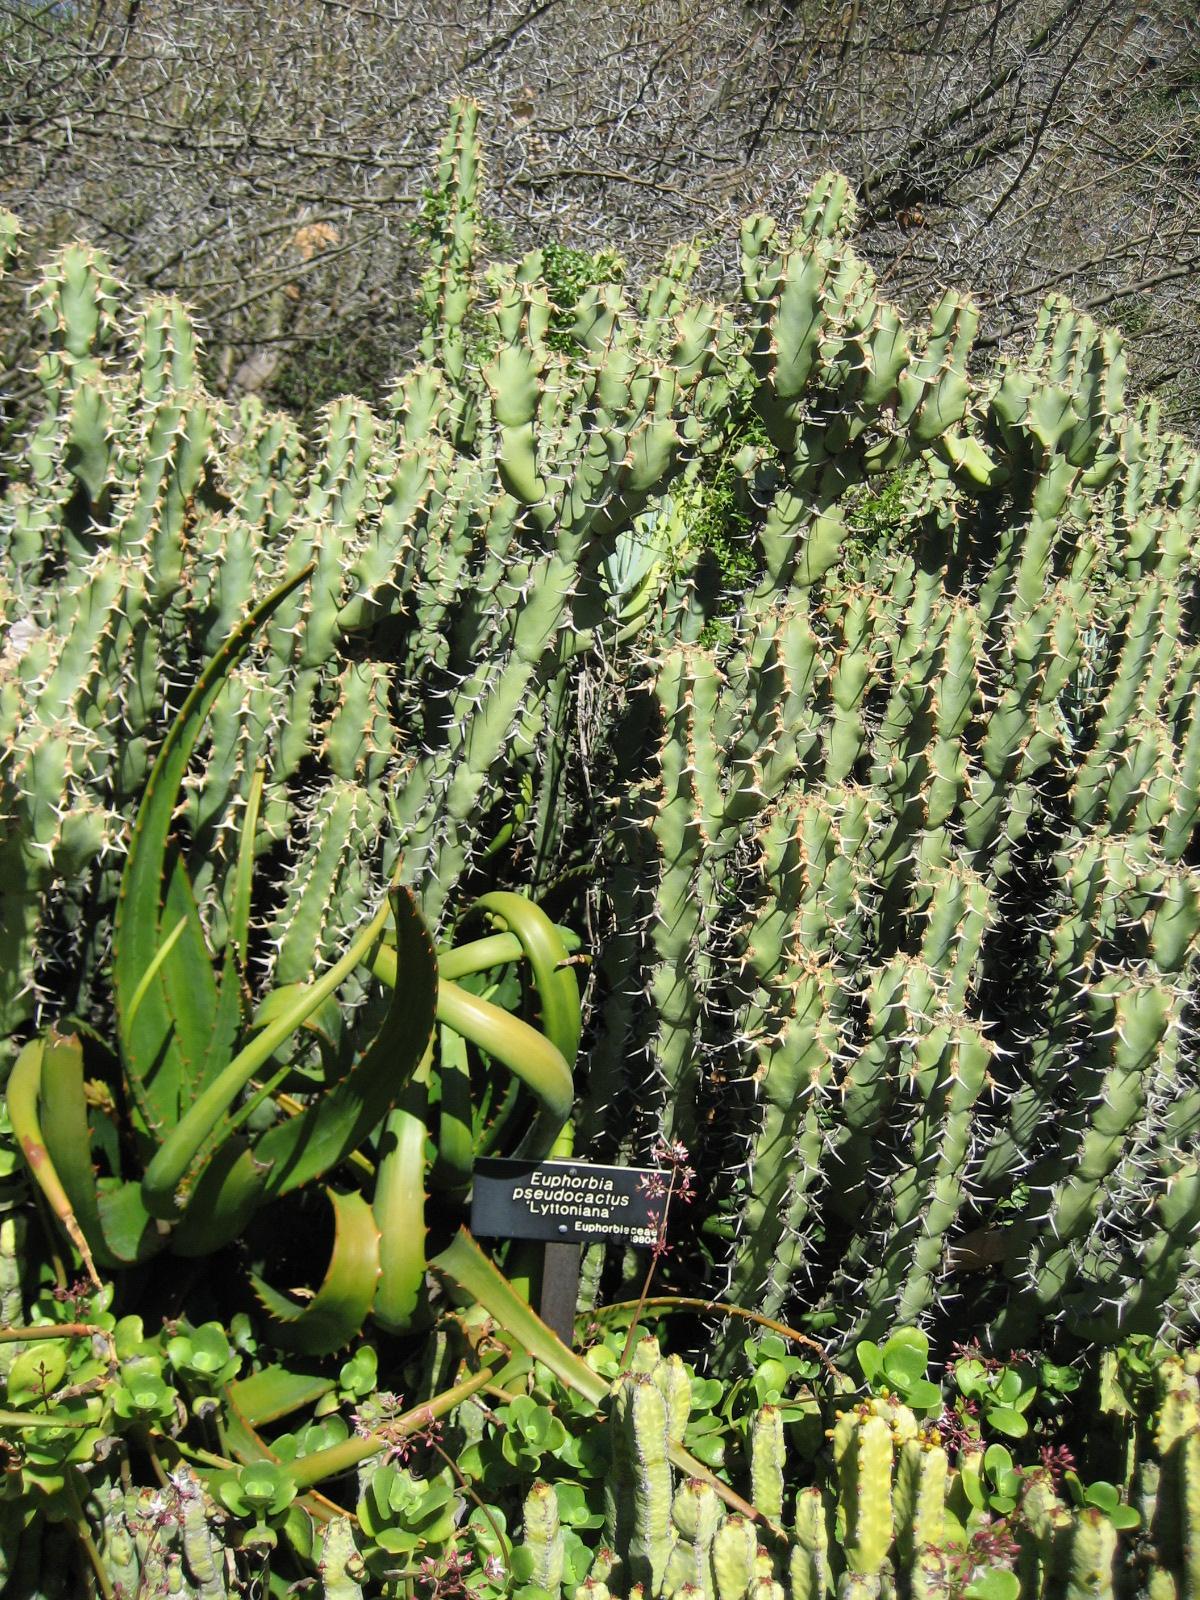 Euphorbia caerulescens la enciclopedia libre